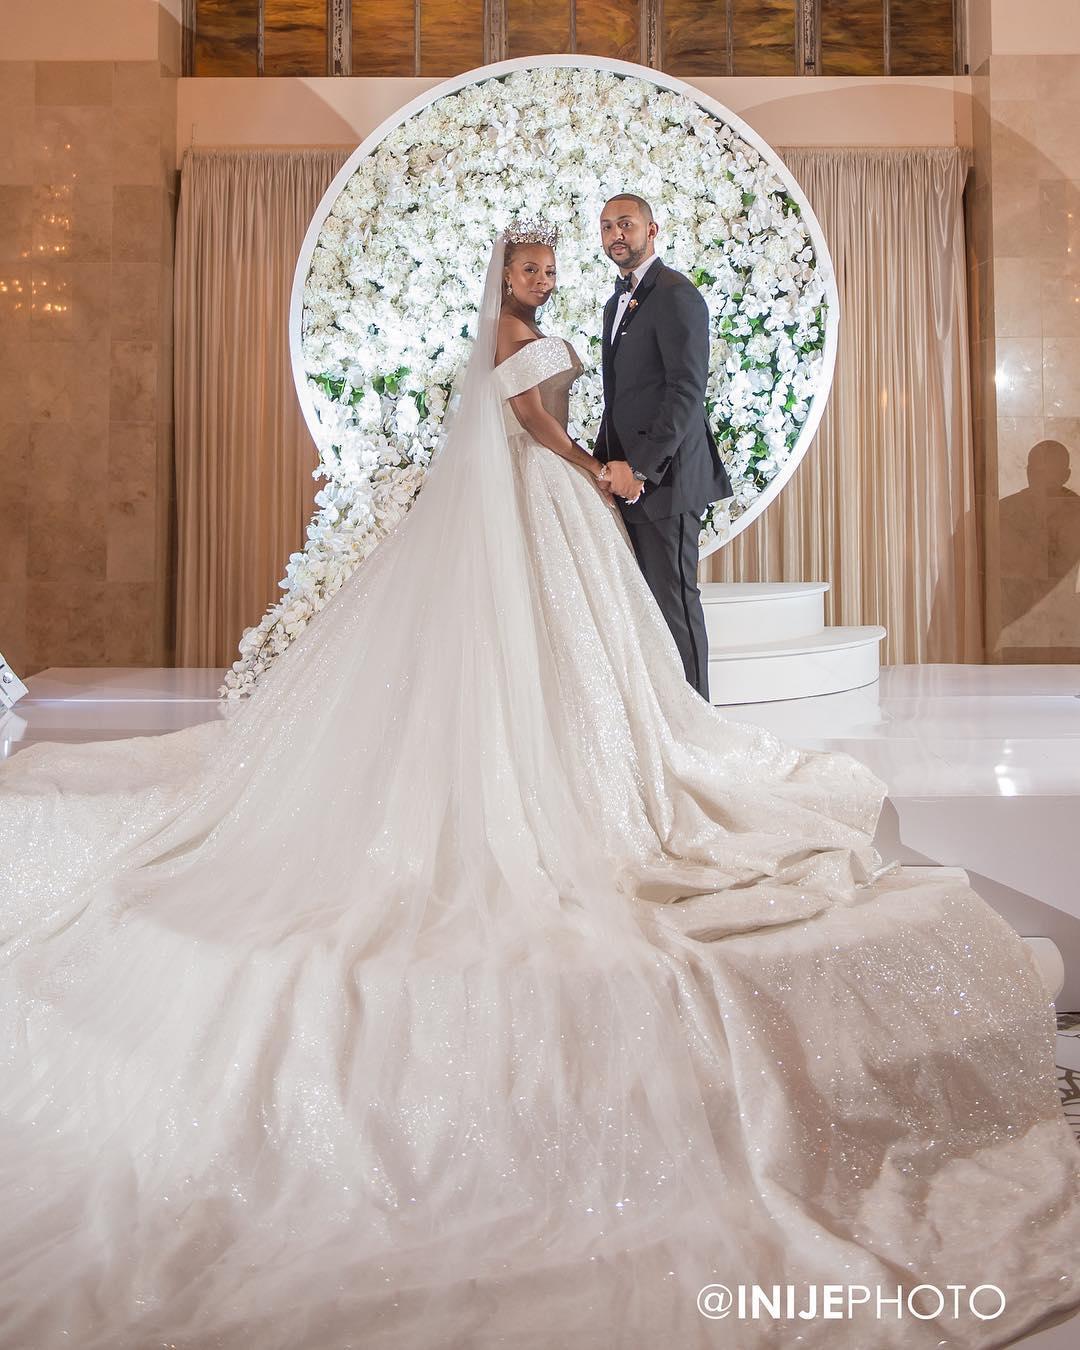 Real Housewives Of Atlanta's Eva Marcille Marries Michael